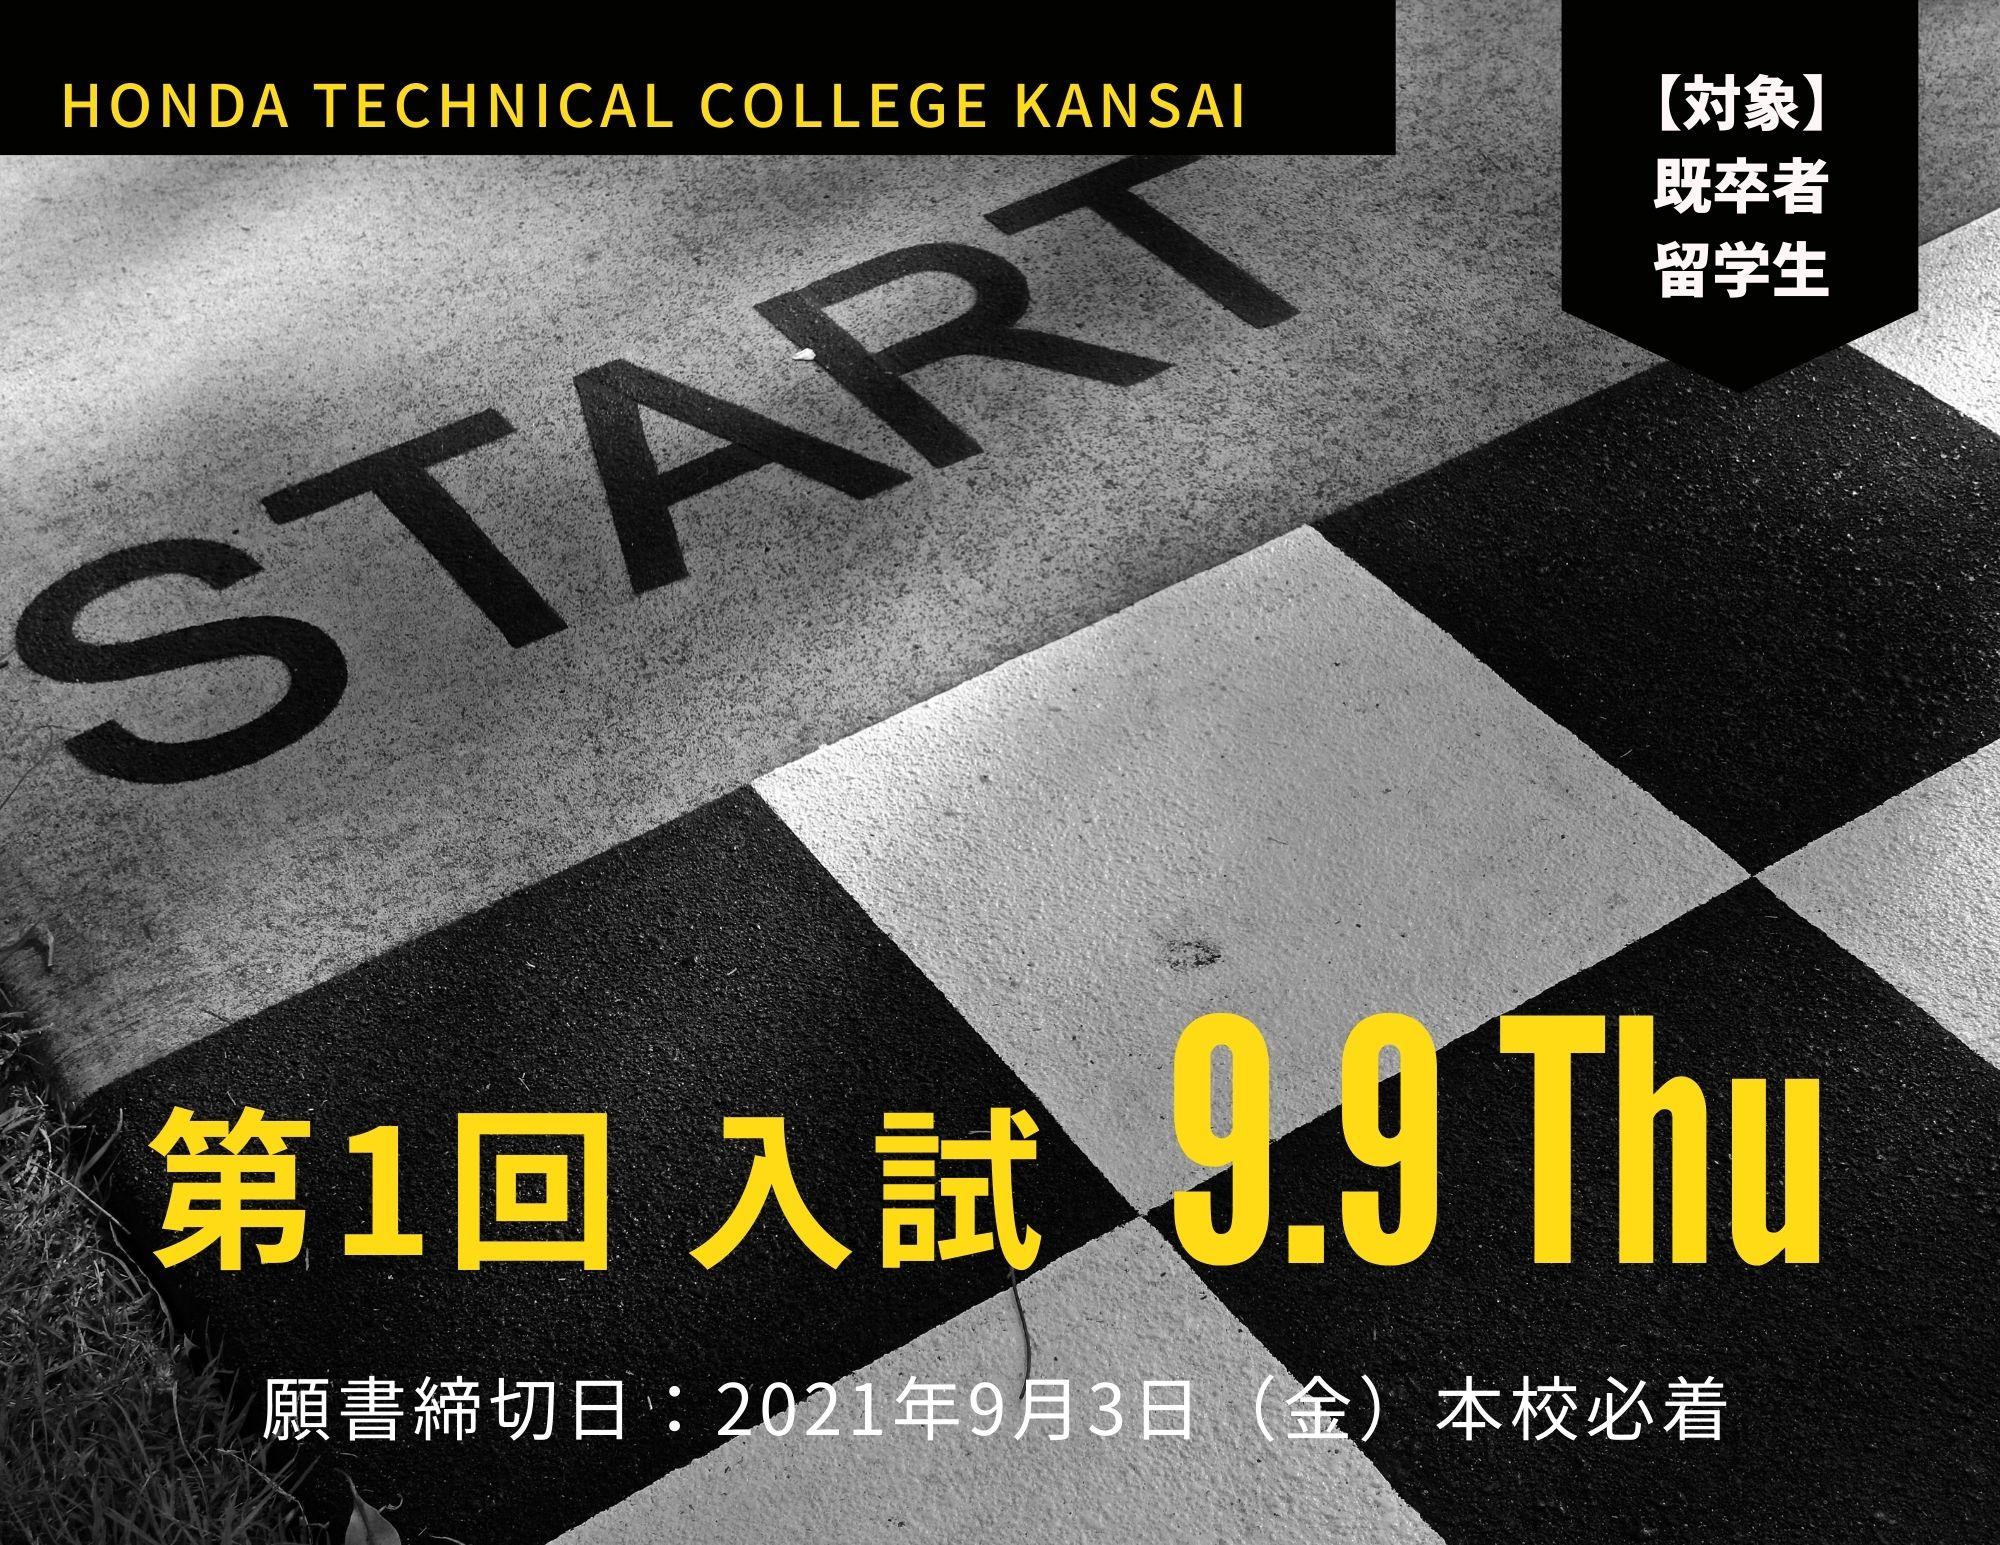 【START】2022年4月入学 第一回入試!